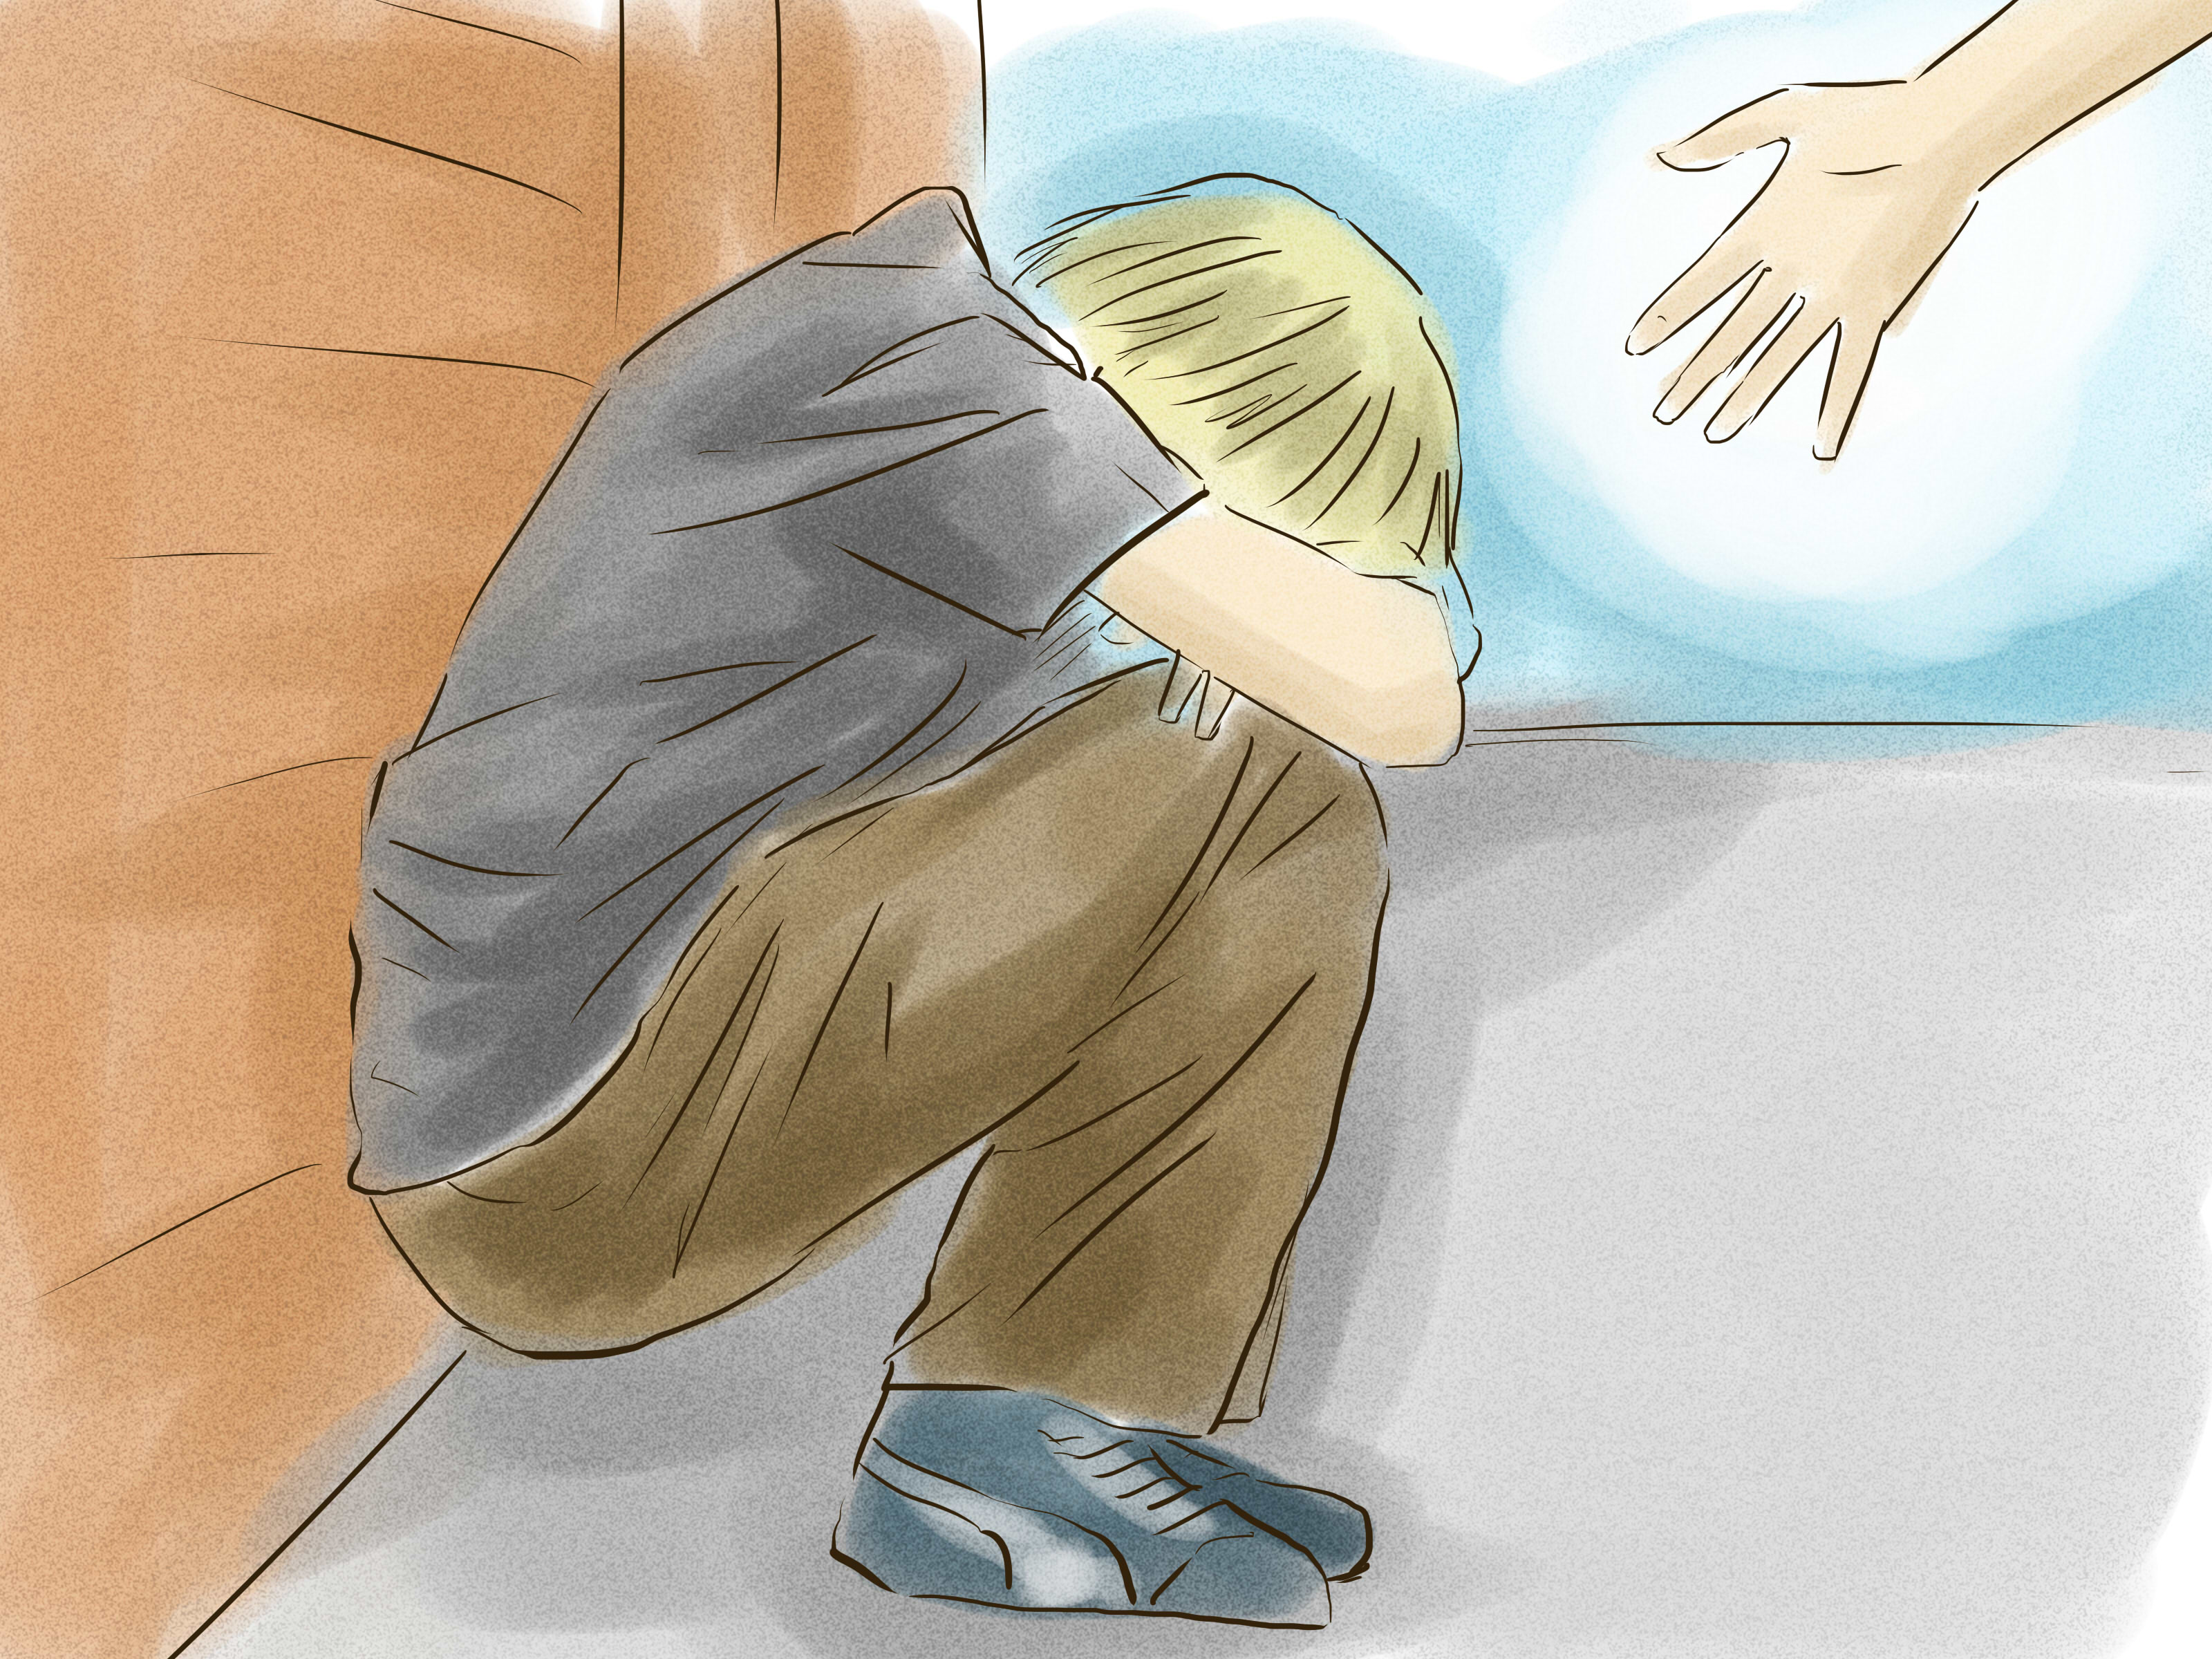 Cmo lidiar con el bullying o abuso 16 pasos